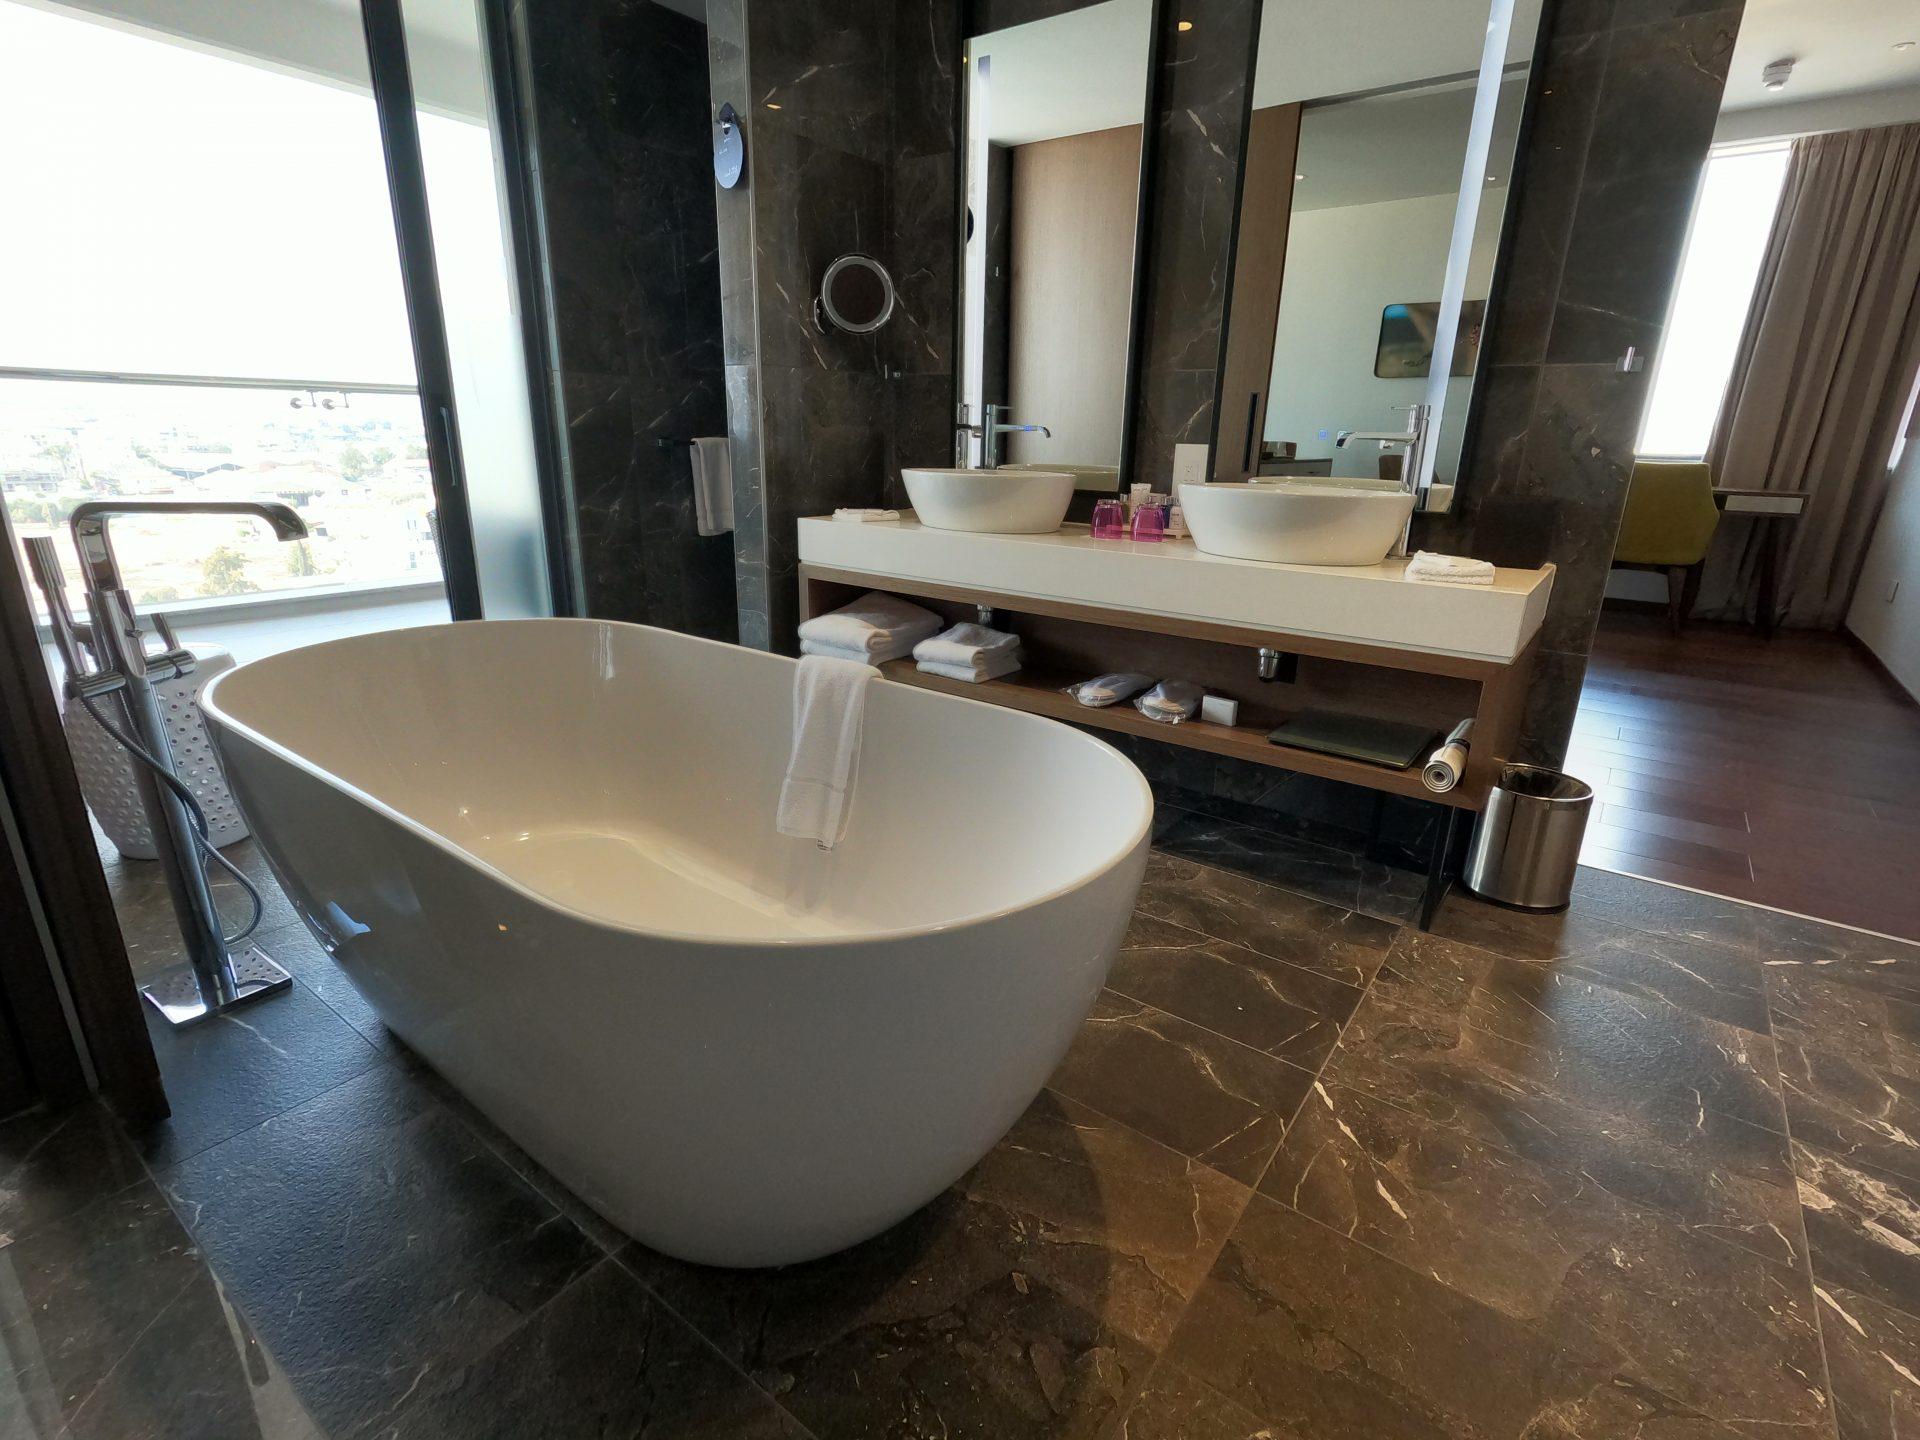 The bath in the bathroom